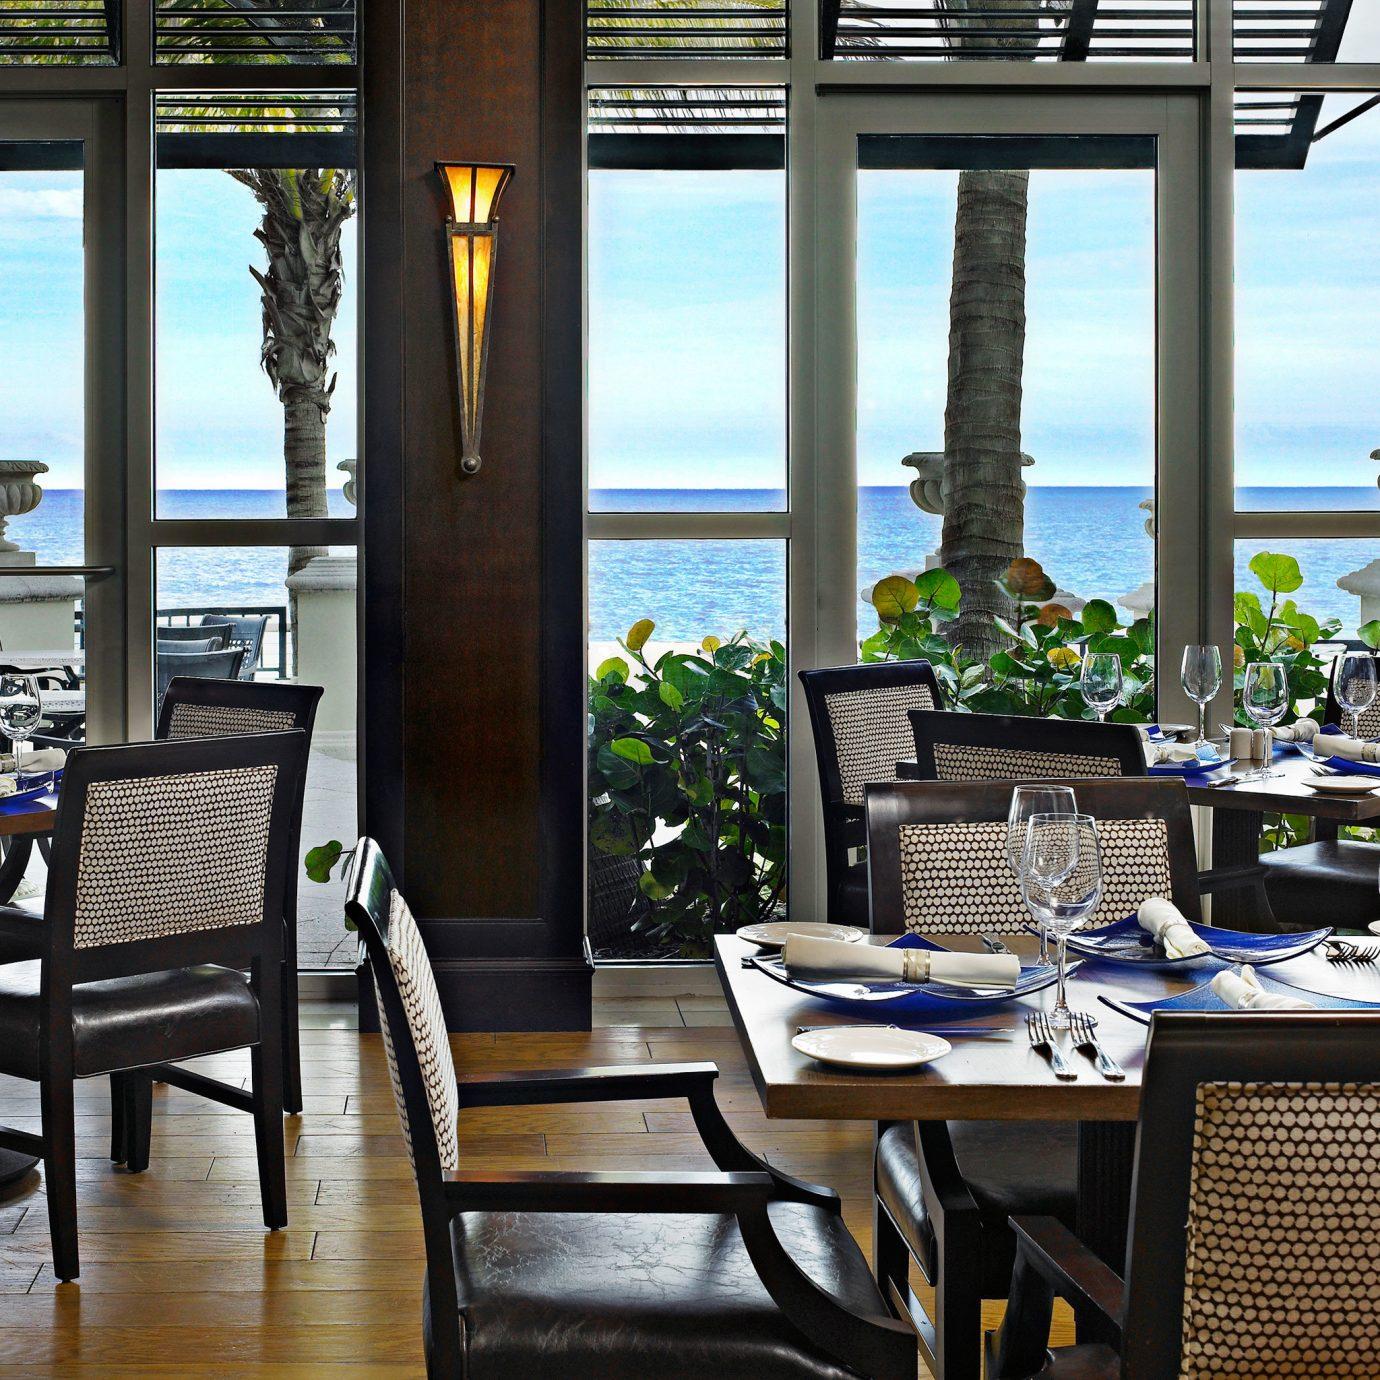 Beachfront Dining Eat Family Modern Trip Ideas chair property restaurant condominium home Resort living room dining table